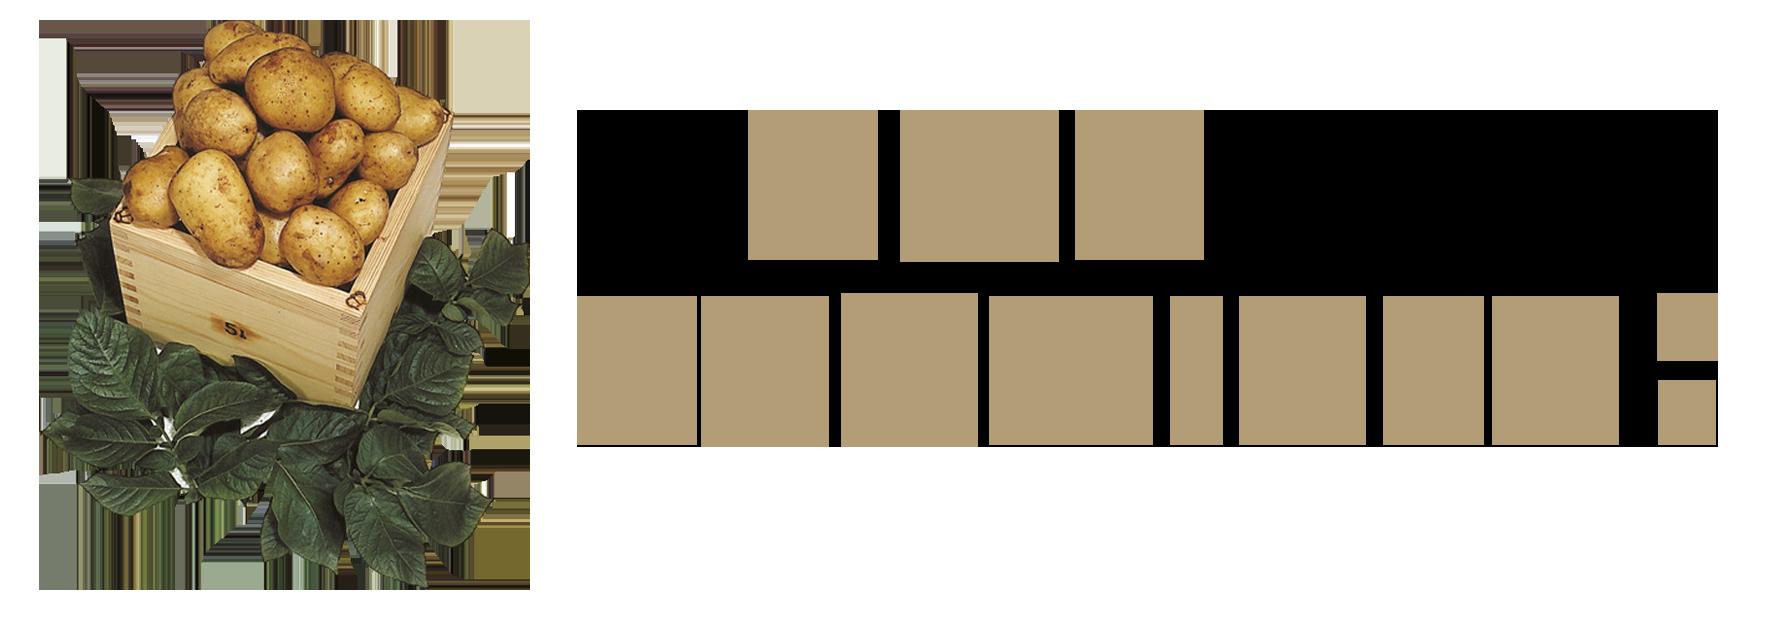 H&H Tuominen Oy